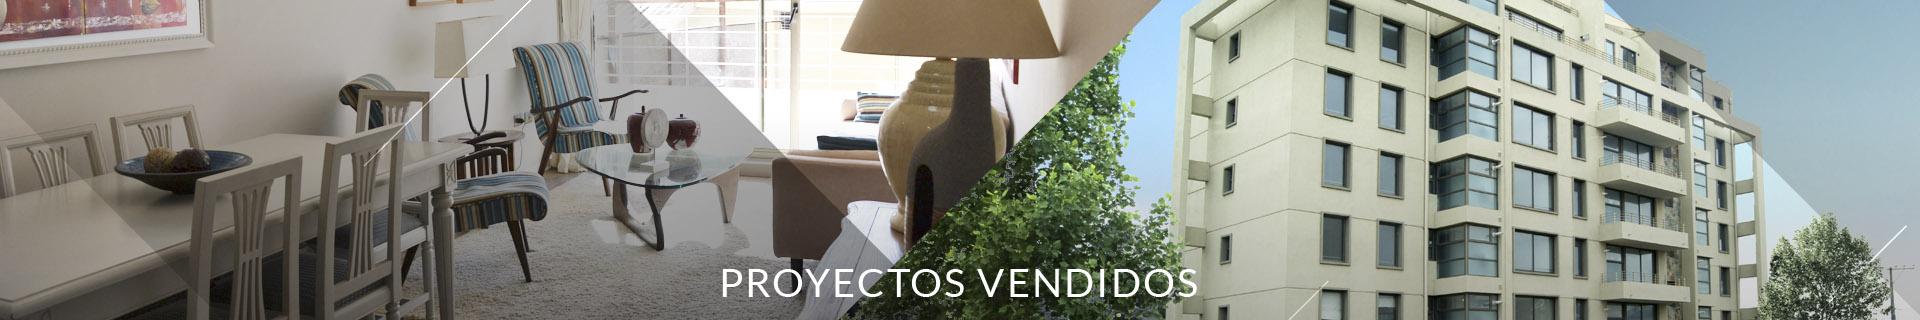 sliders_ProyectosVendidos